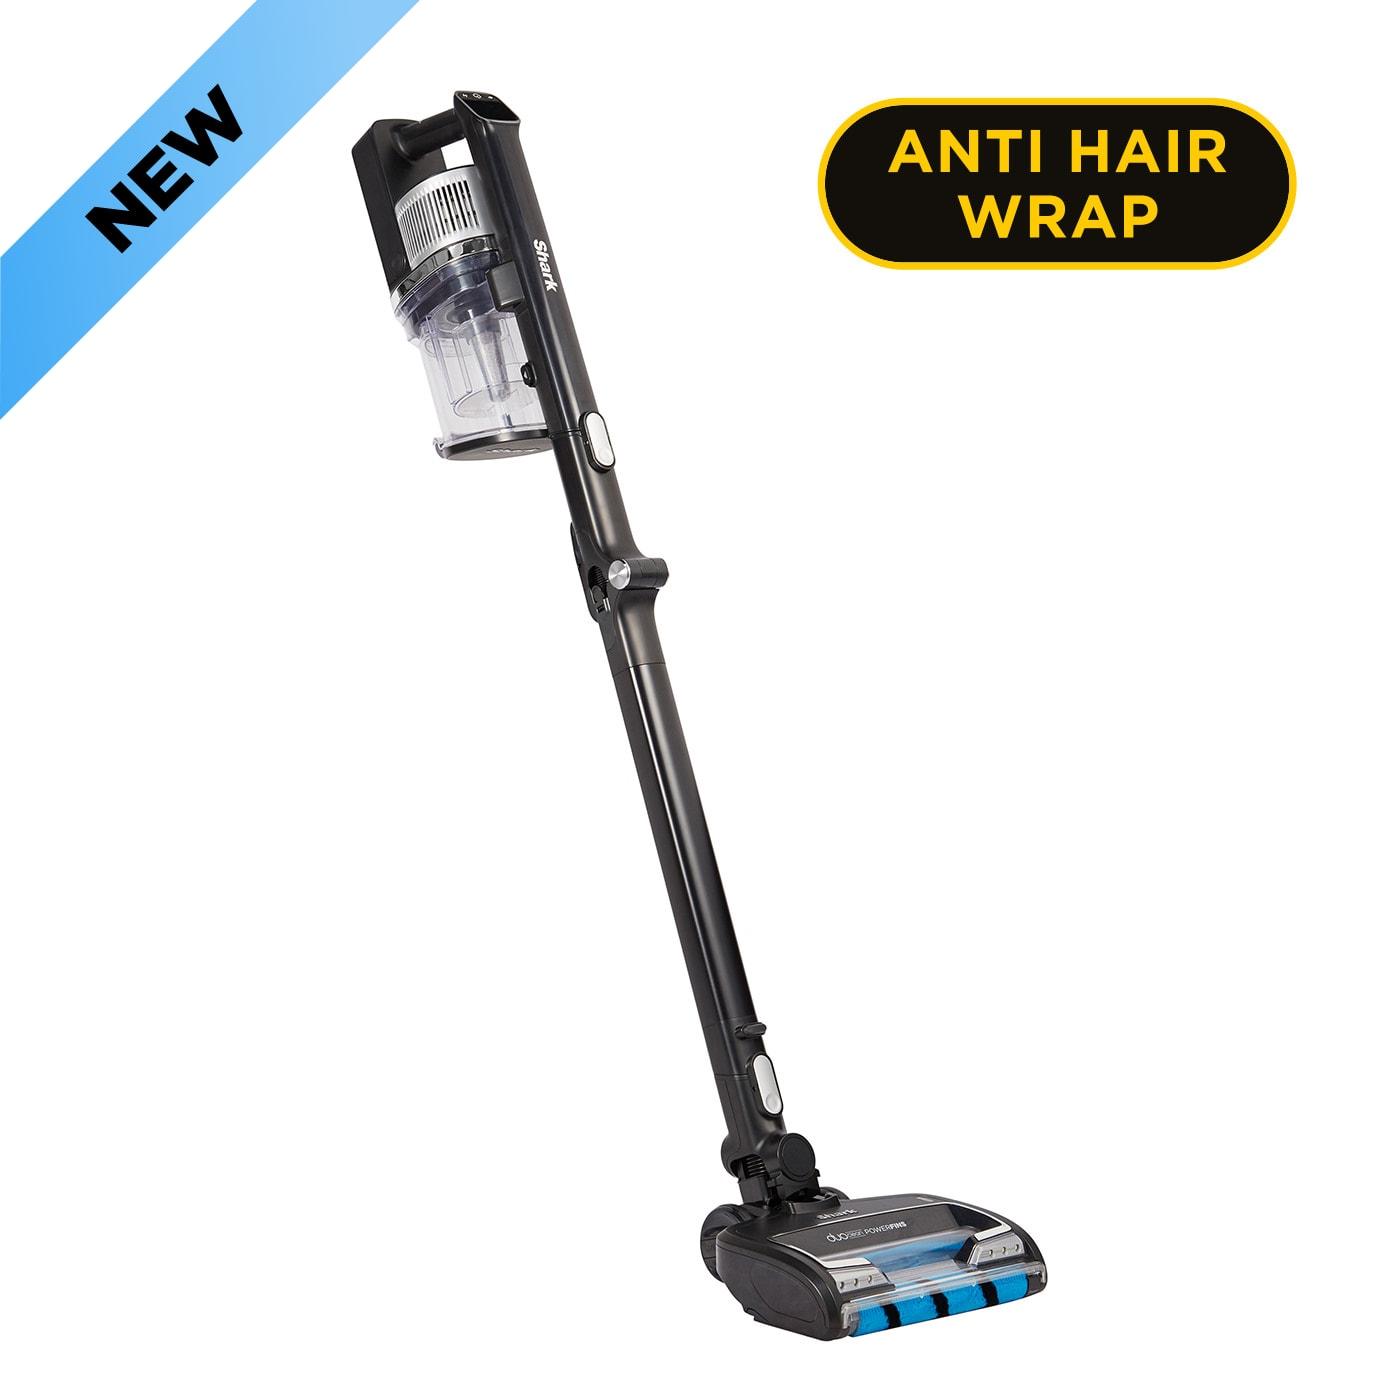 Shark Anti Hair Wrap Cordless Stick Vacuum Cleaner with PowerFins & Flexology [Twin Battery] IZ320UK product photo